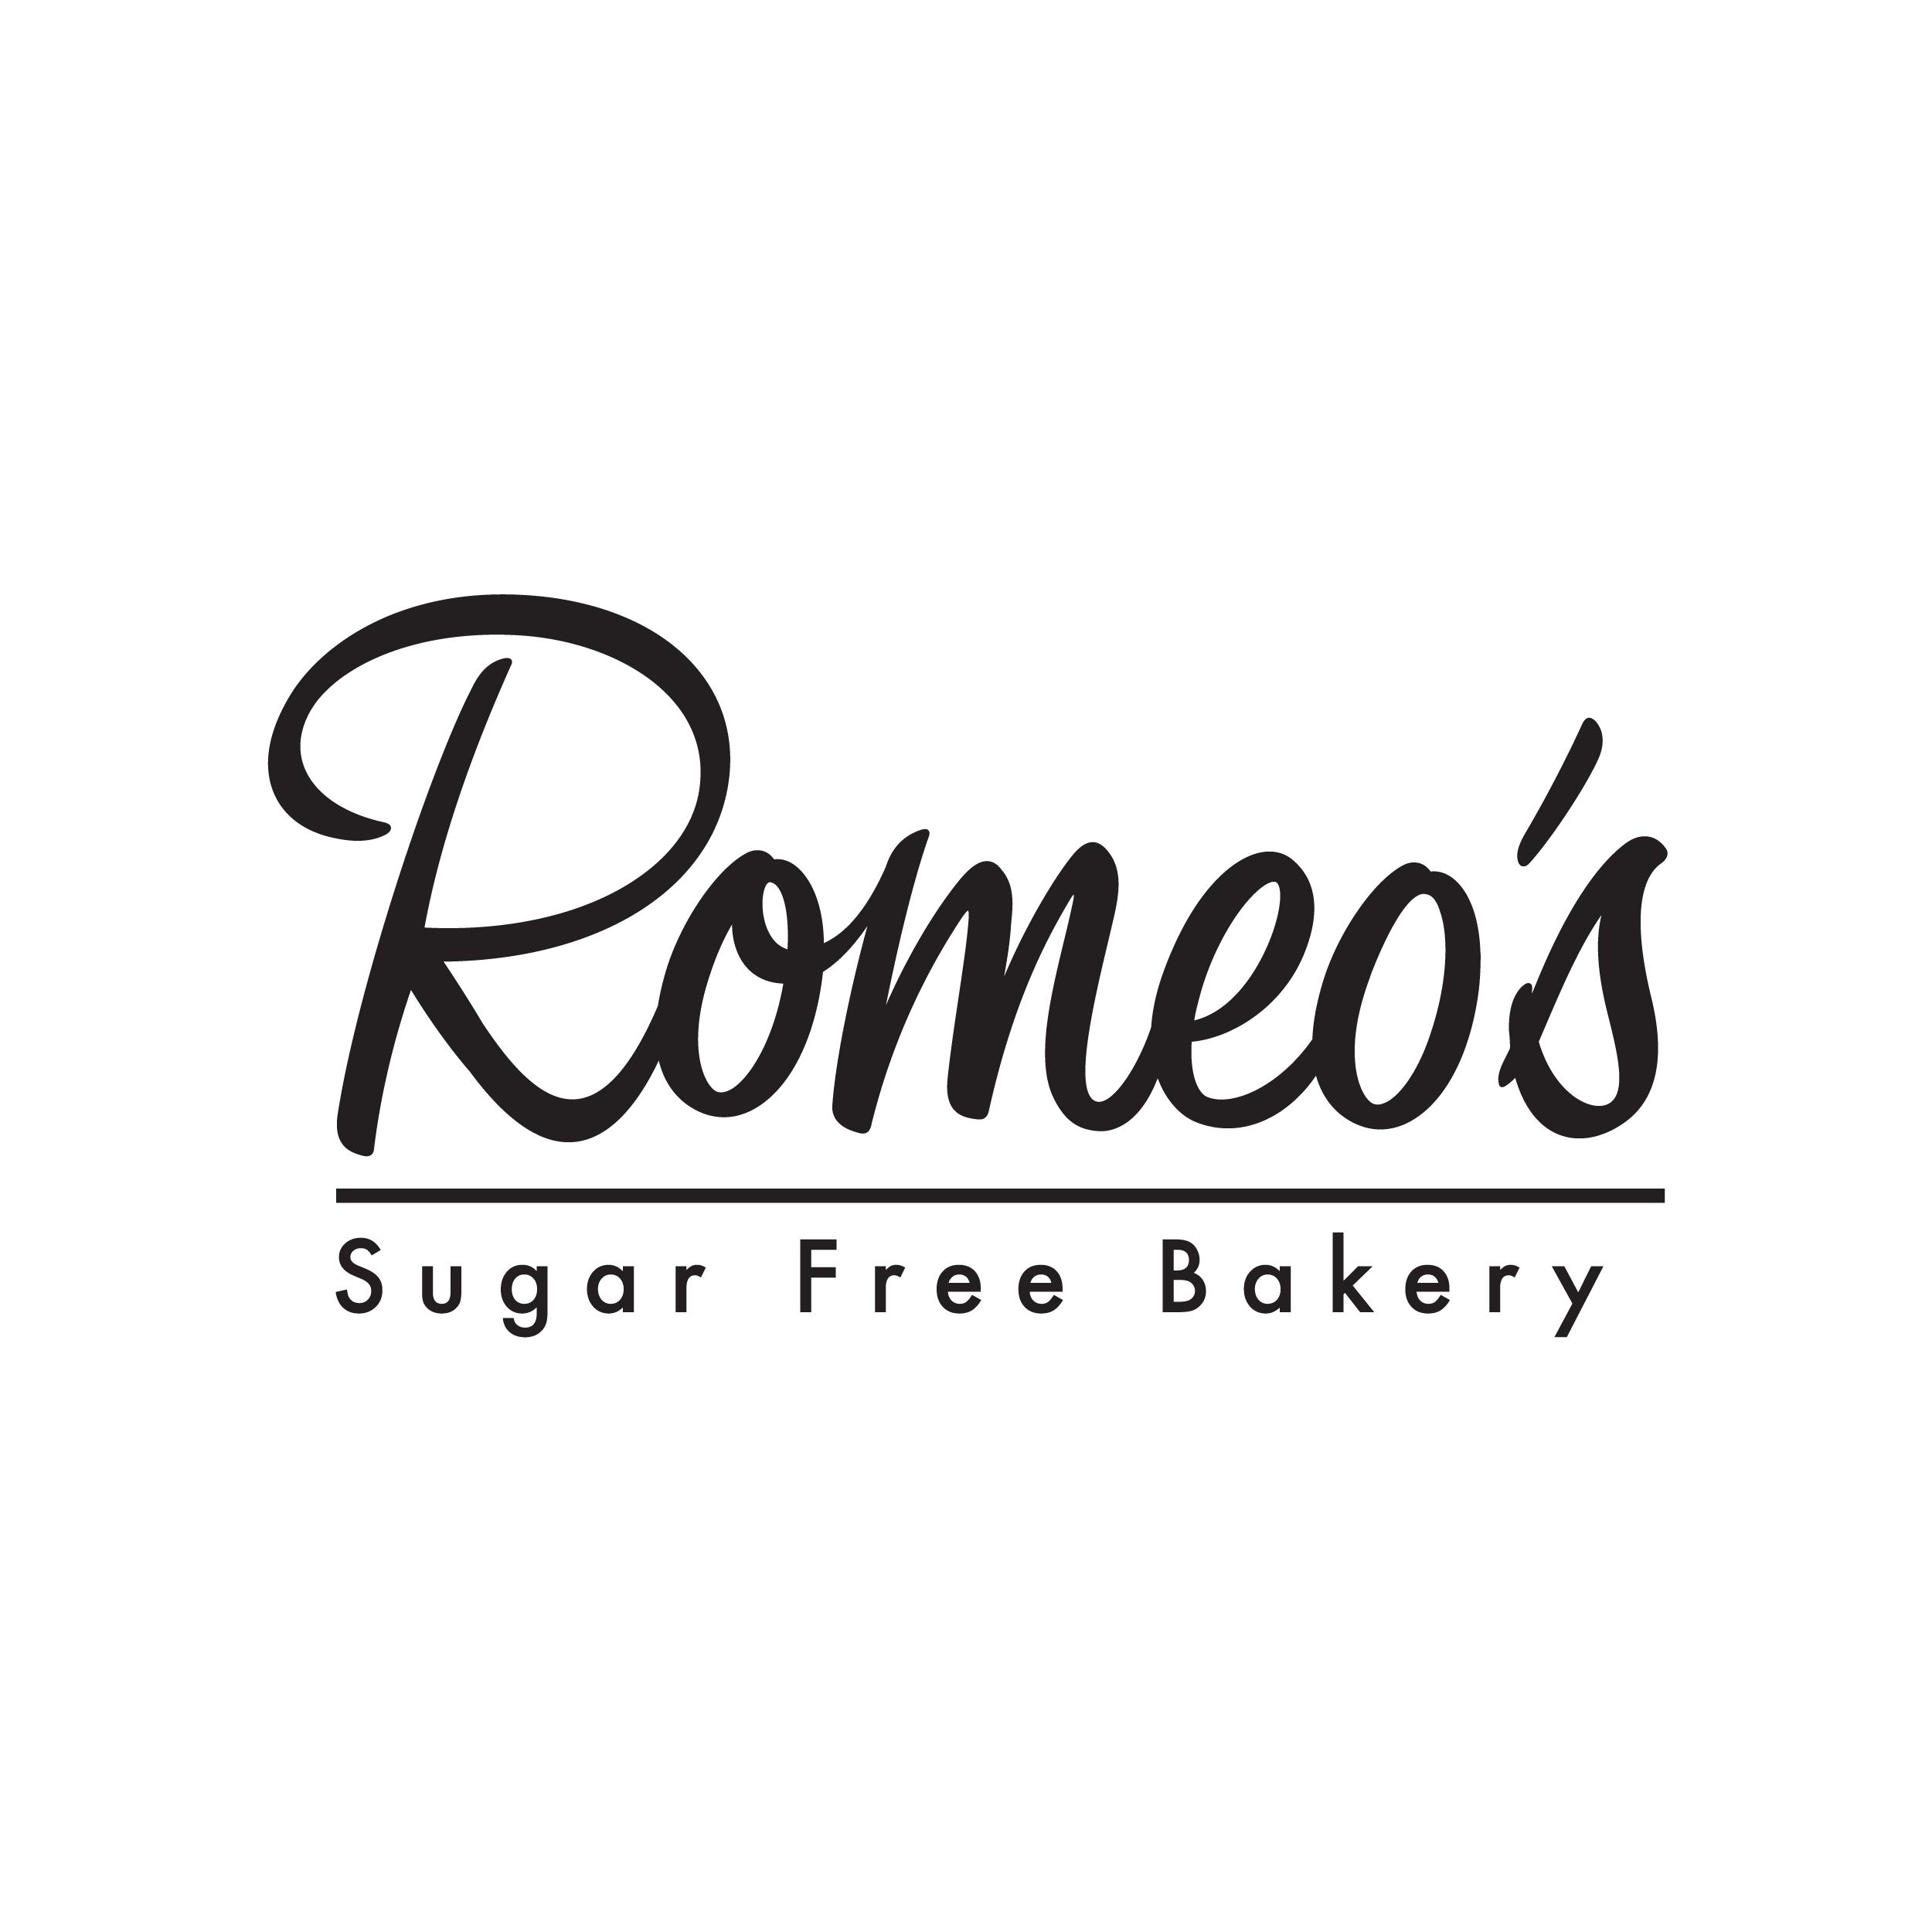 Romeos_Sugar_Free_Bakery